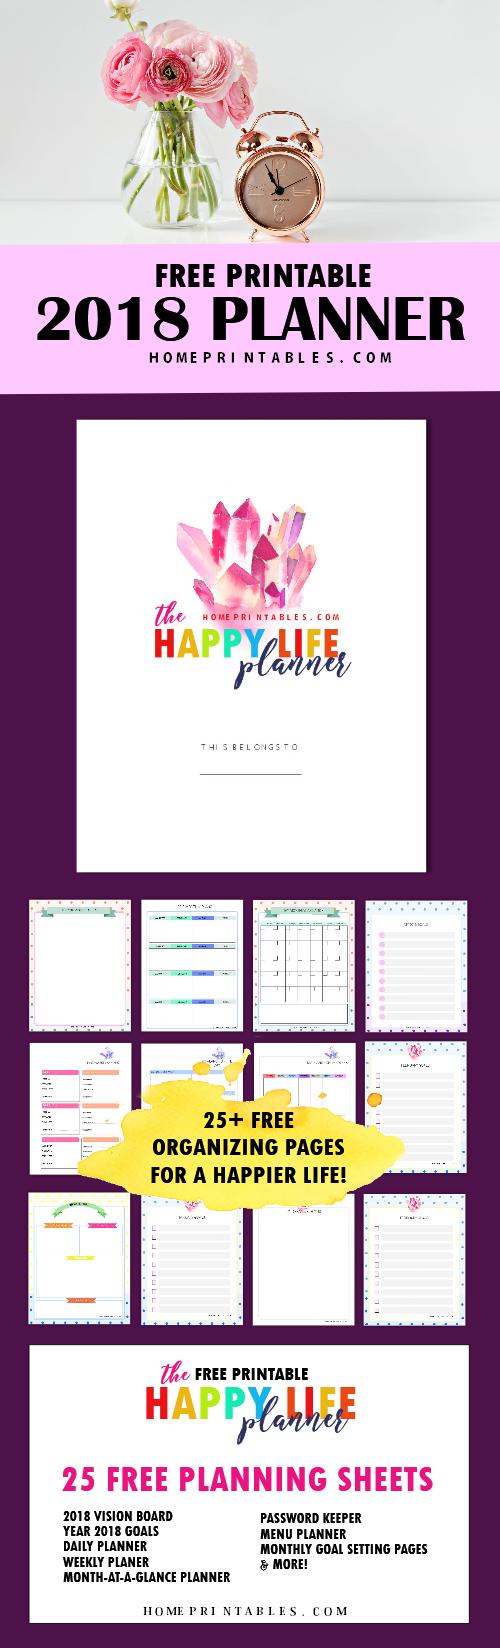 FREE Printable 2018 Planner: 25 Amazing Organizers